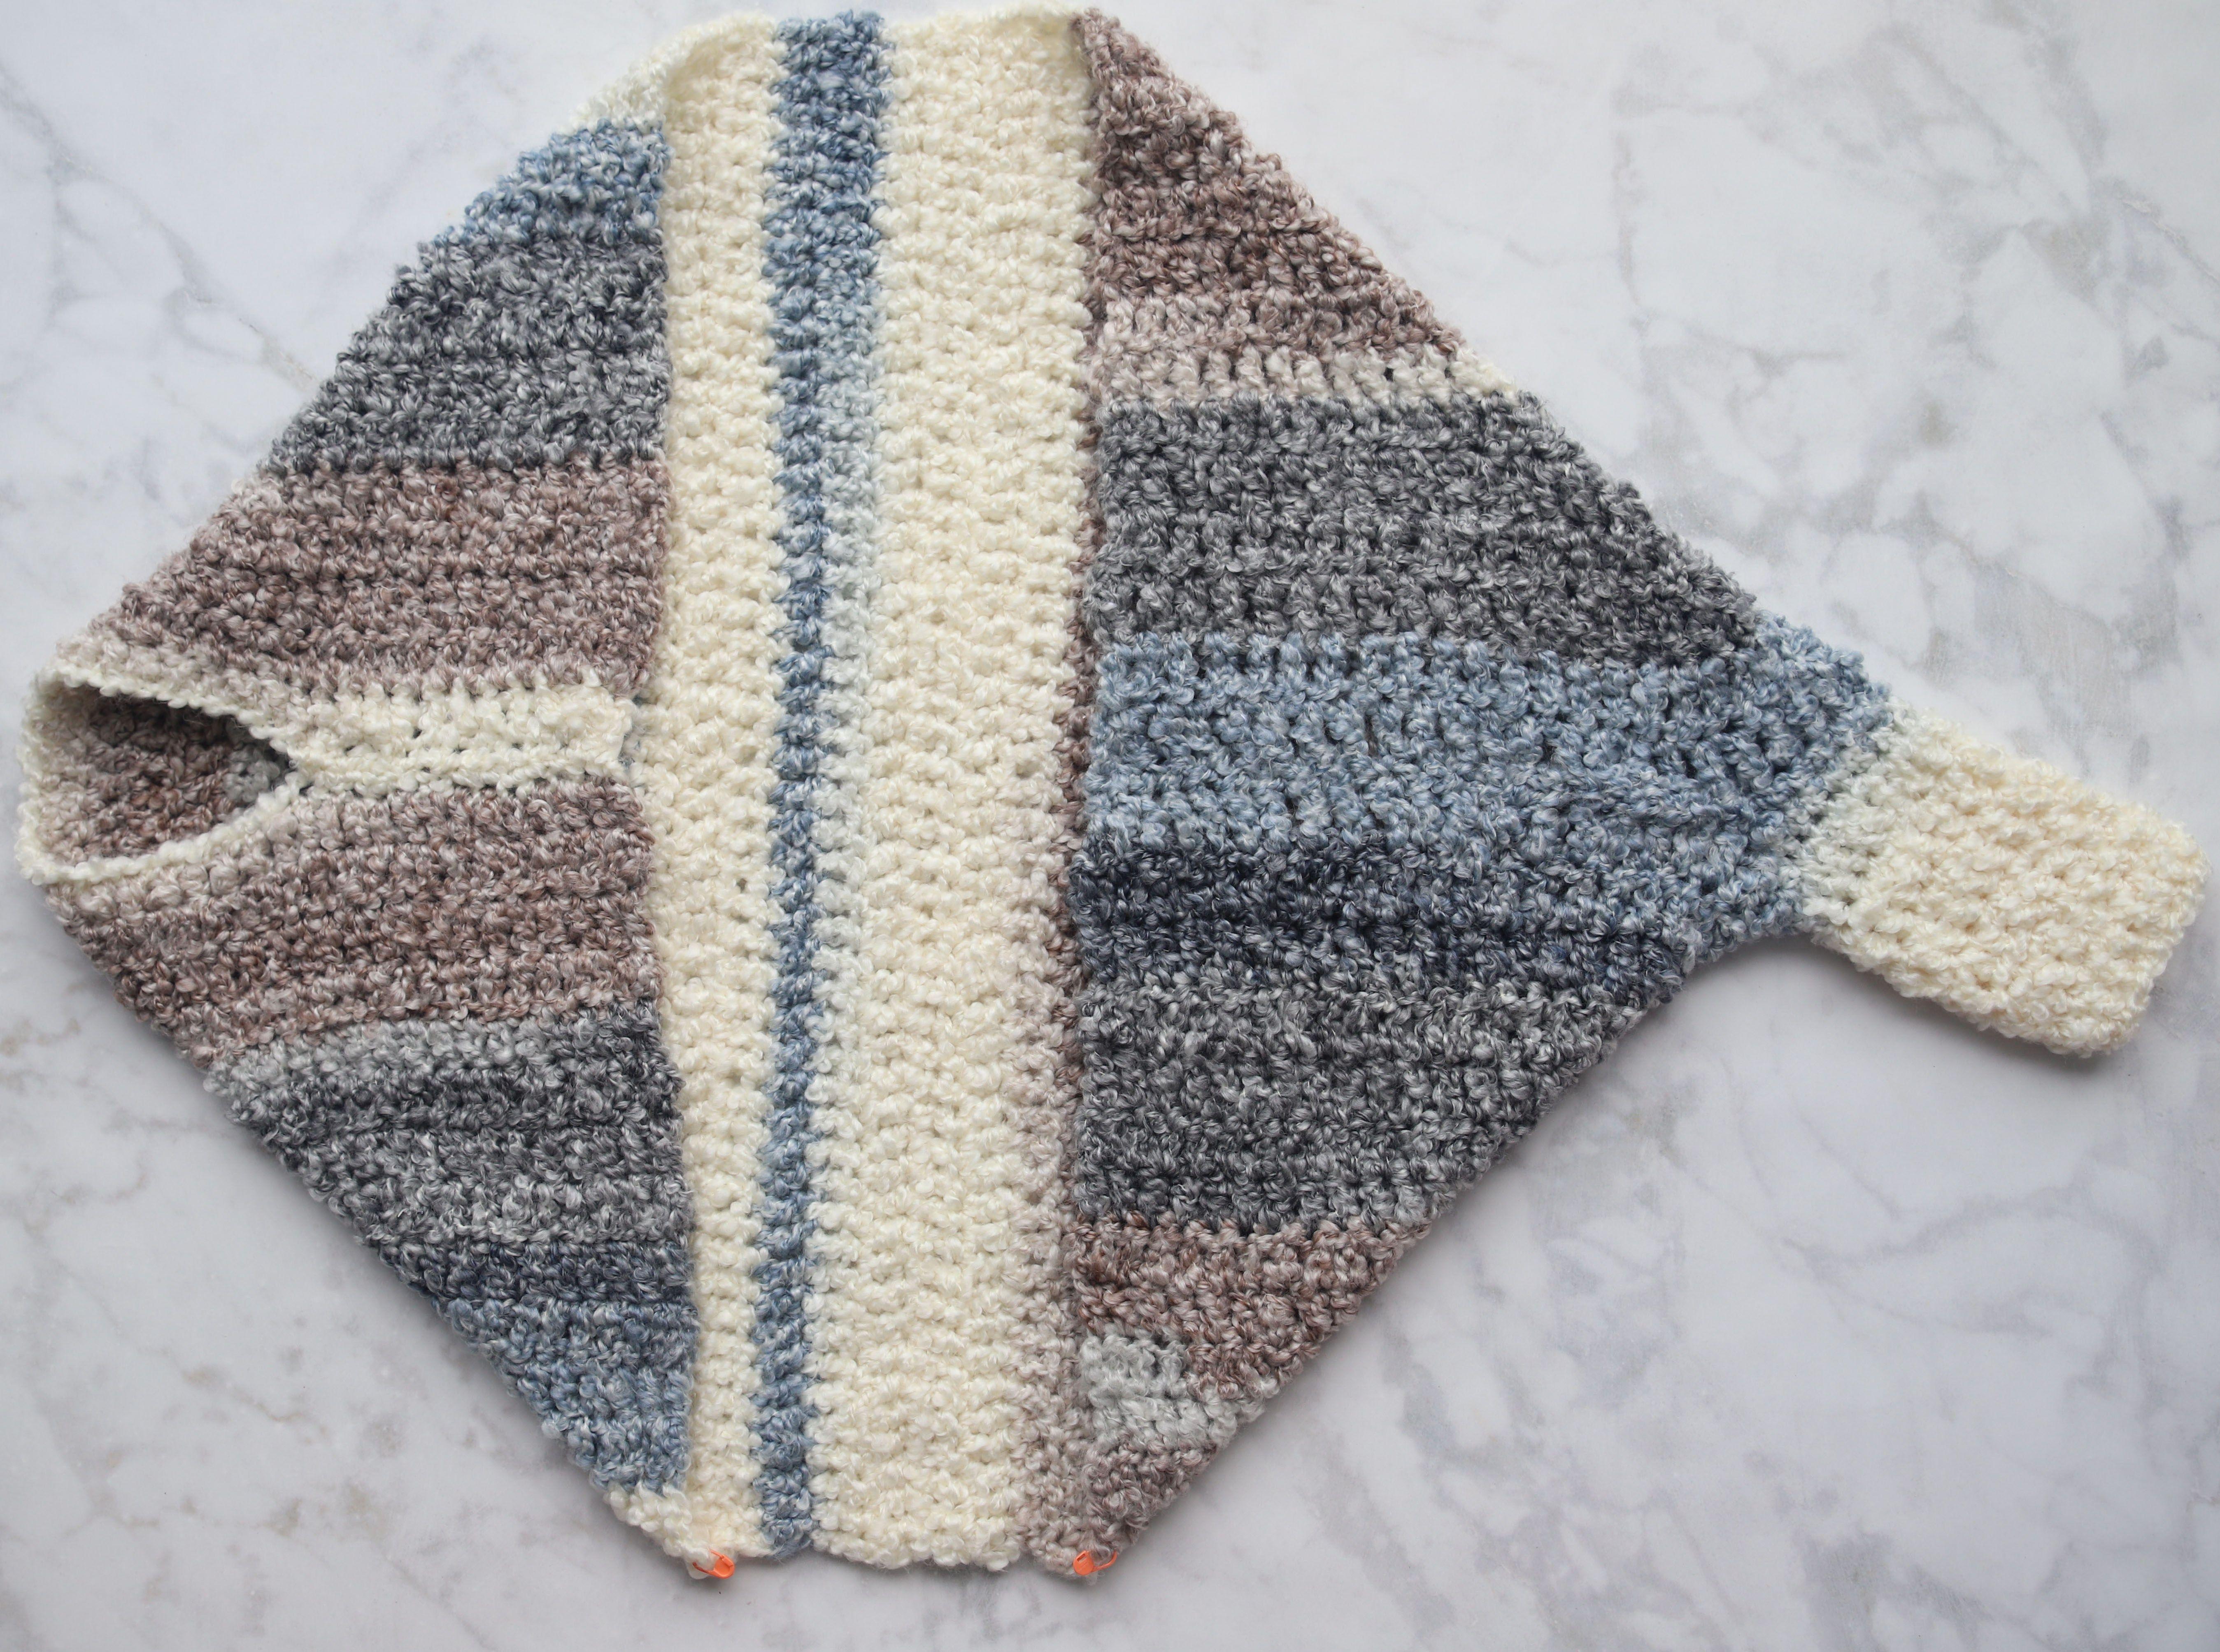 Crochet cuddler cocoon sweater cocoon sweater crochet and easy crochet cuddler cocoon sweater bankloansurffo Gallery